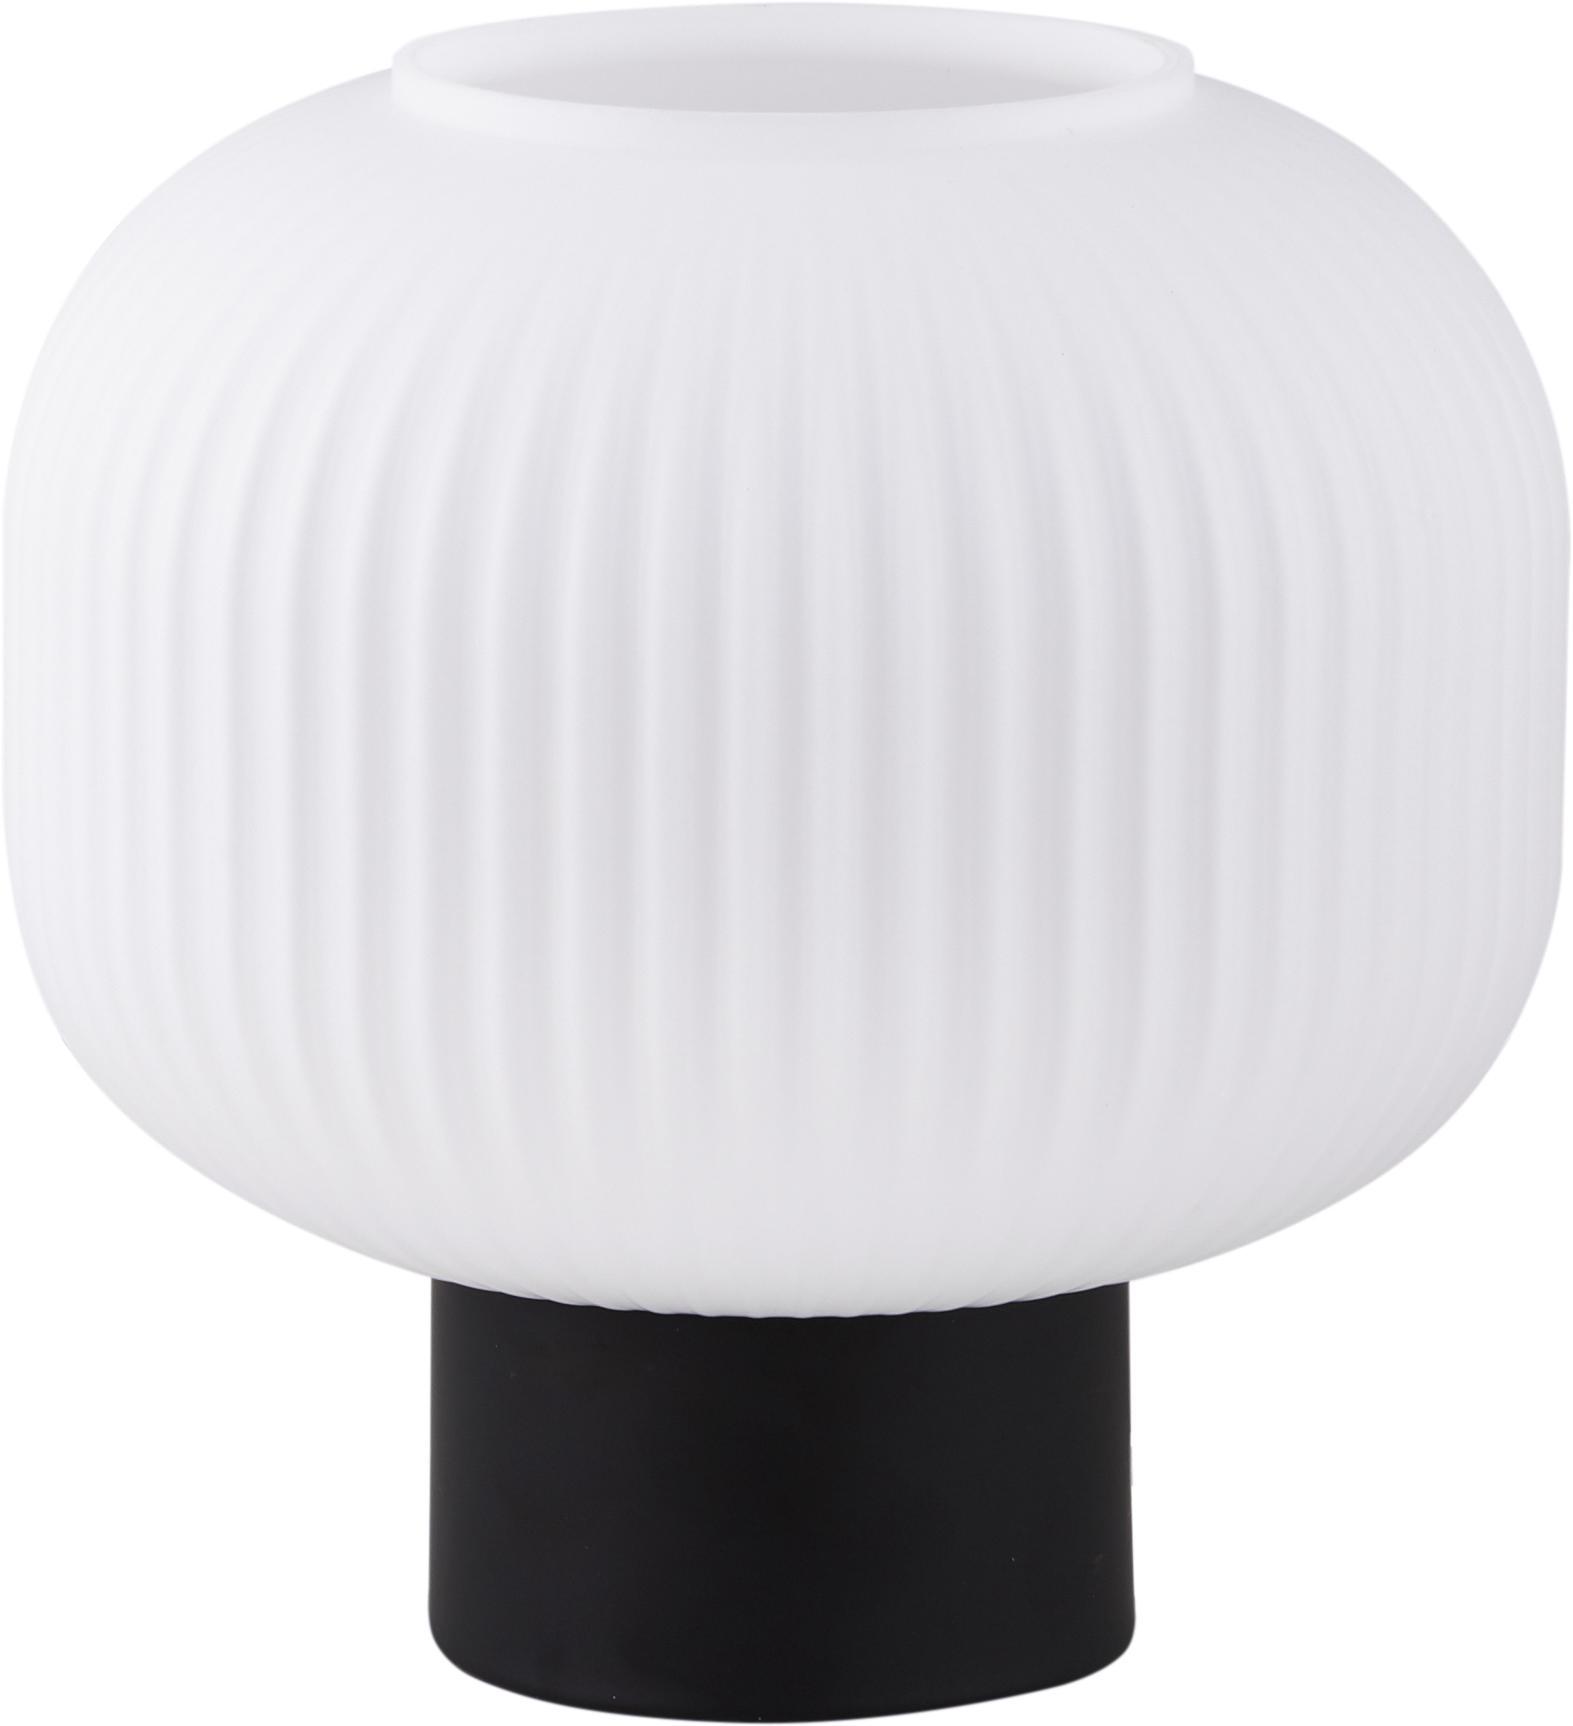 Tischlampe Charlie aus Opalglas, Lampenschirm: Opalglas, Schwarz, Opalweiss, Ø 20 x H 20 cm